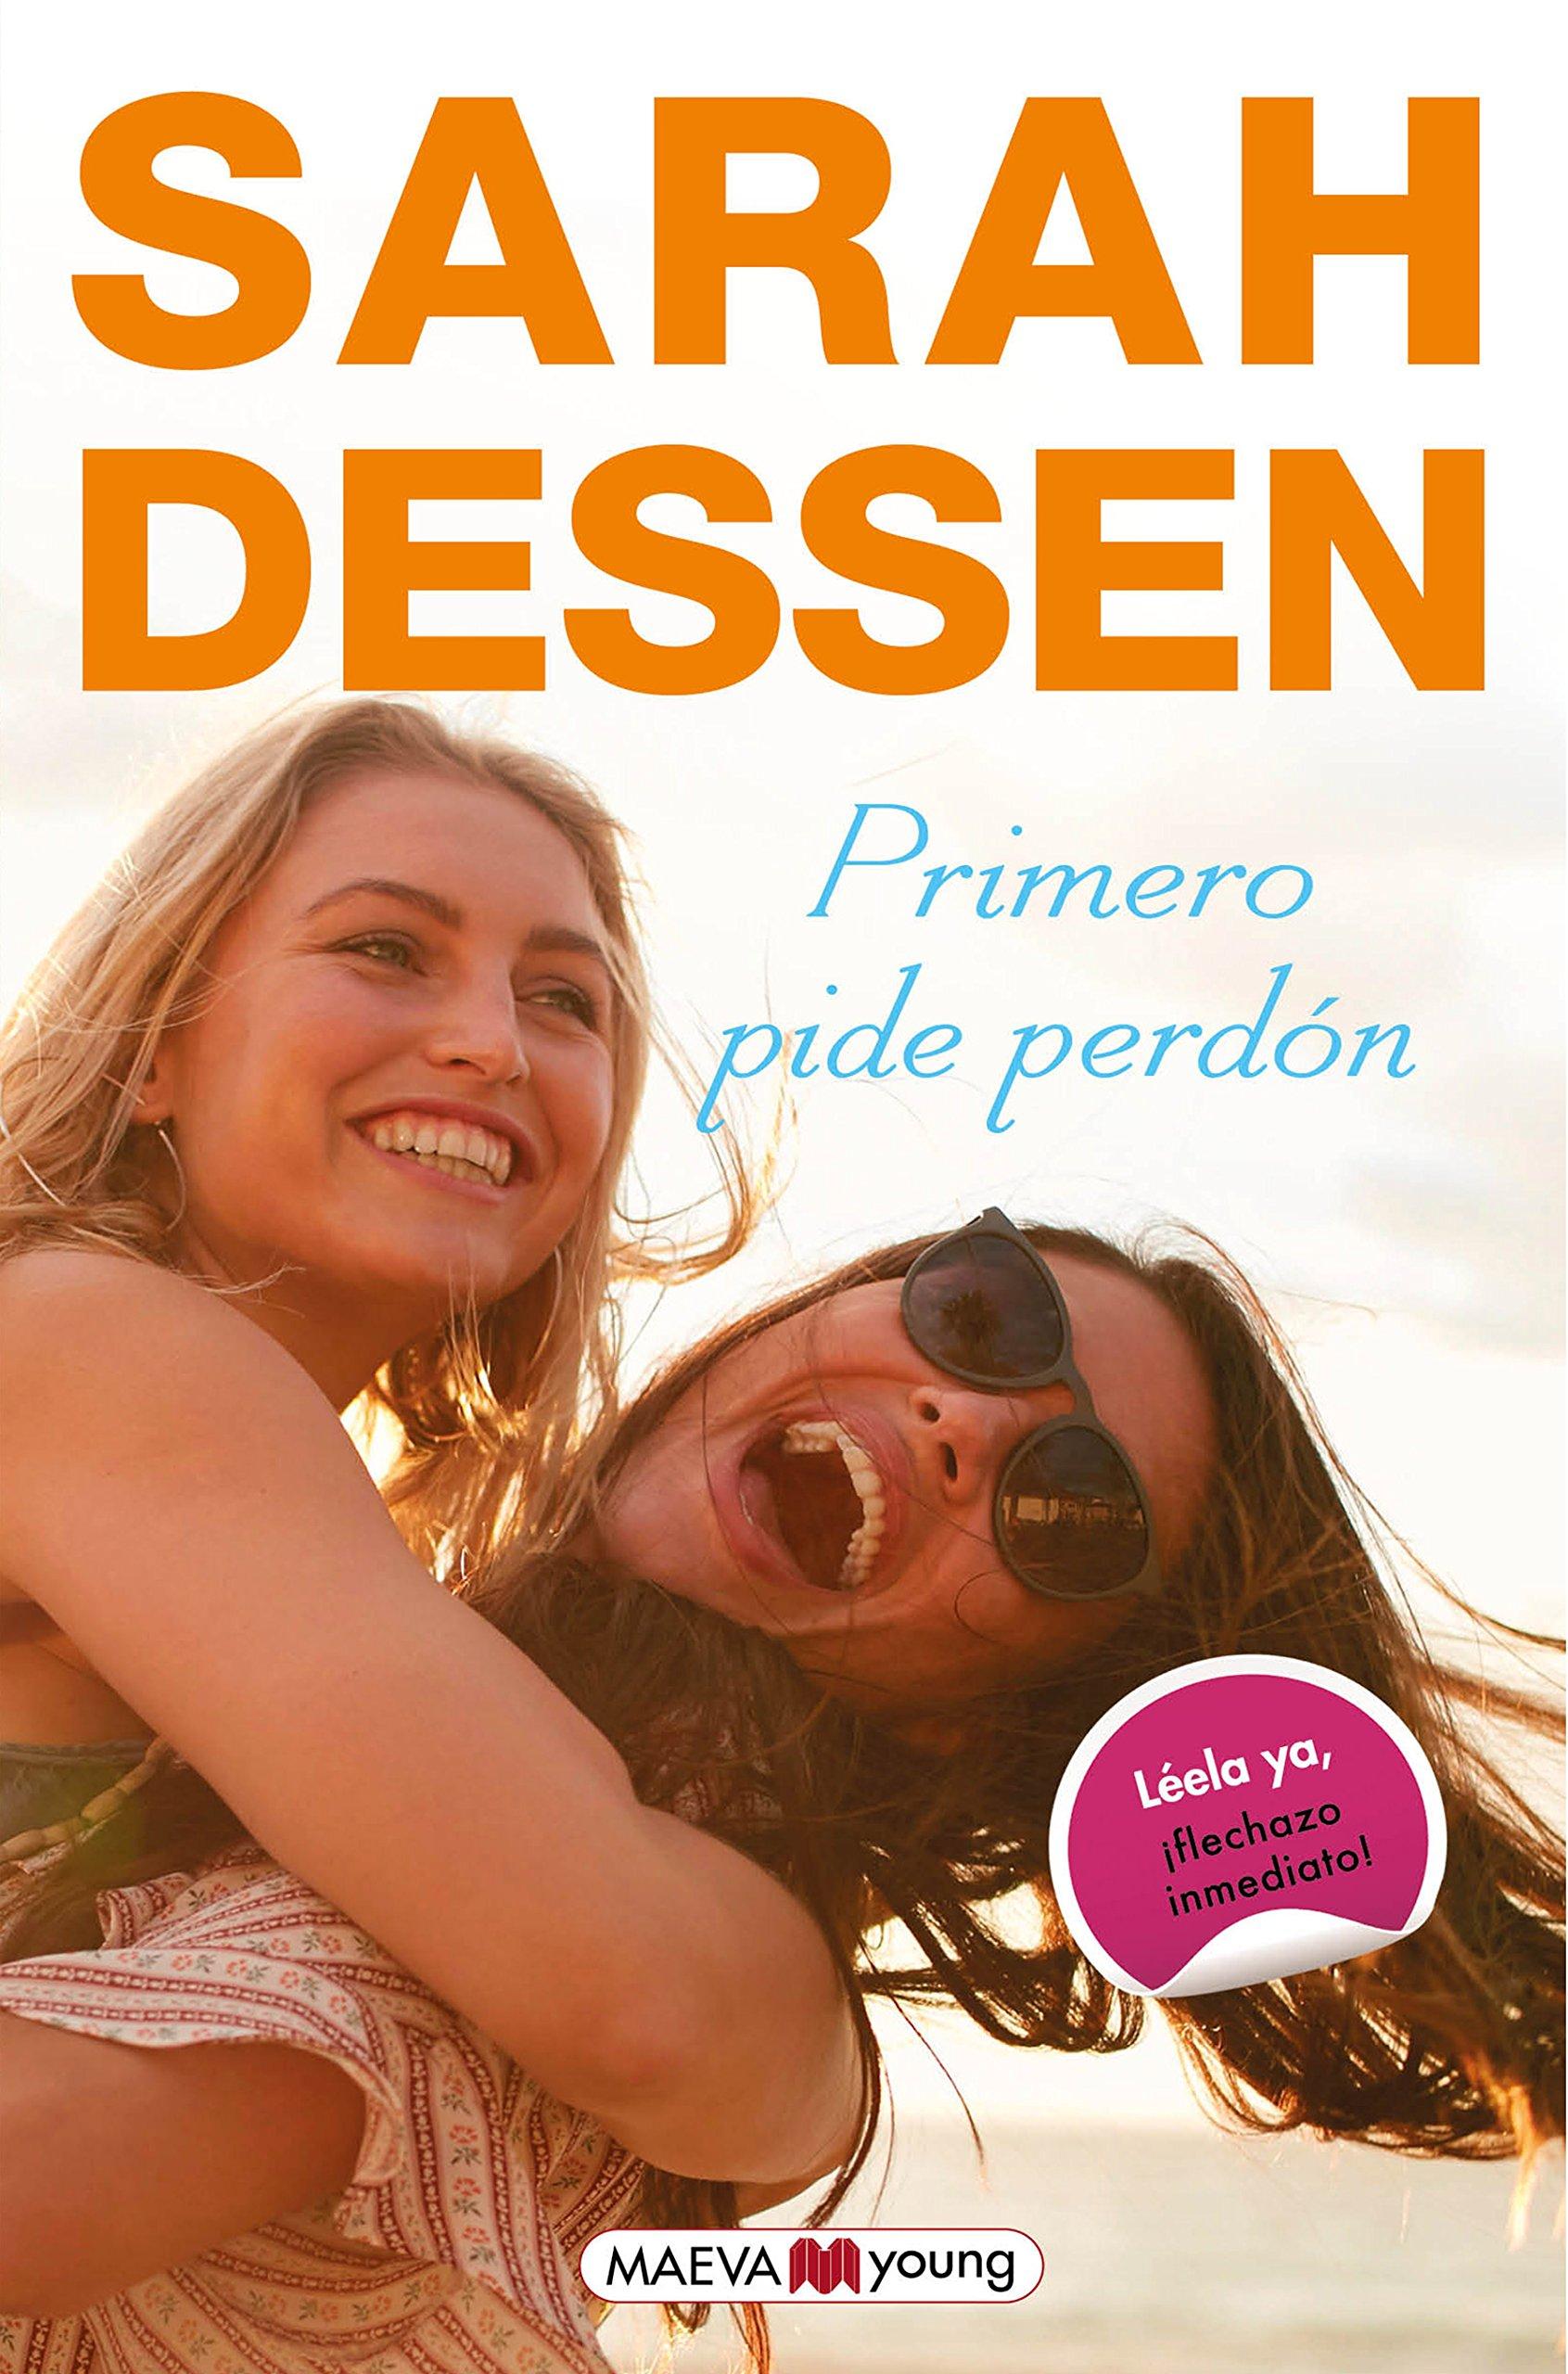 Primero pide perdón (Maeva Young): Amazon.es: Sarah Dessen, Sonia Fernández Ordás: Libros